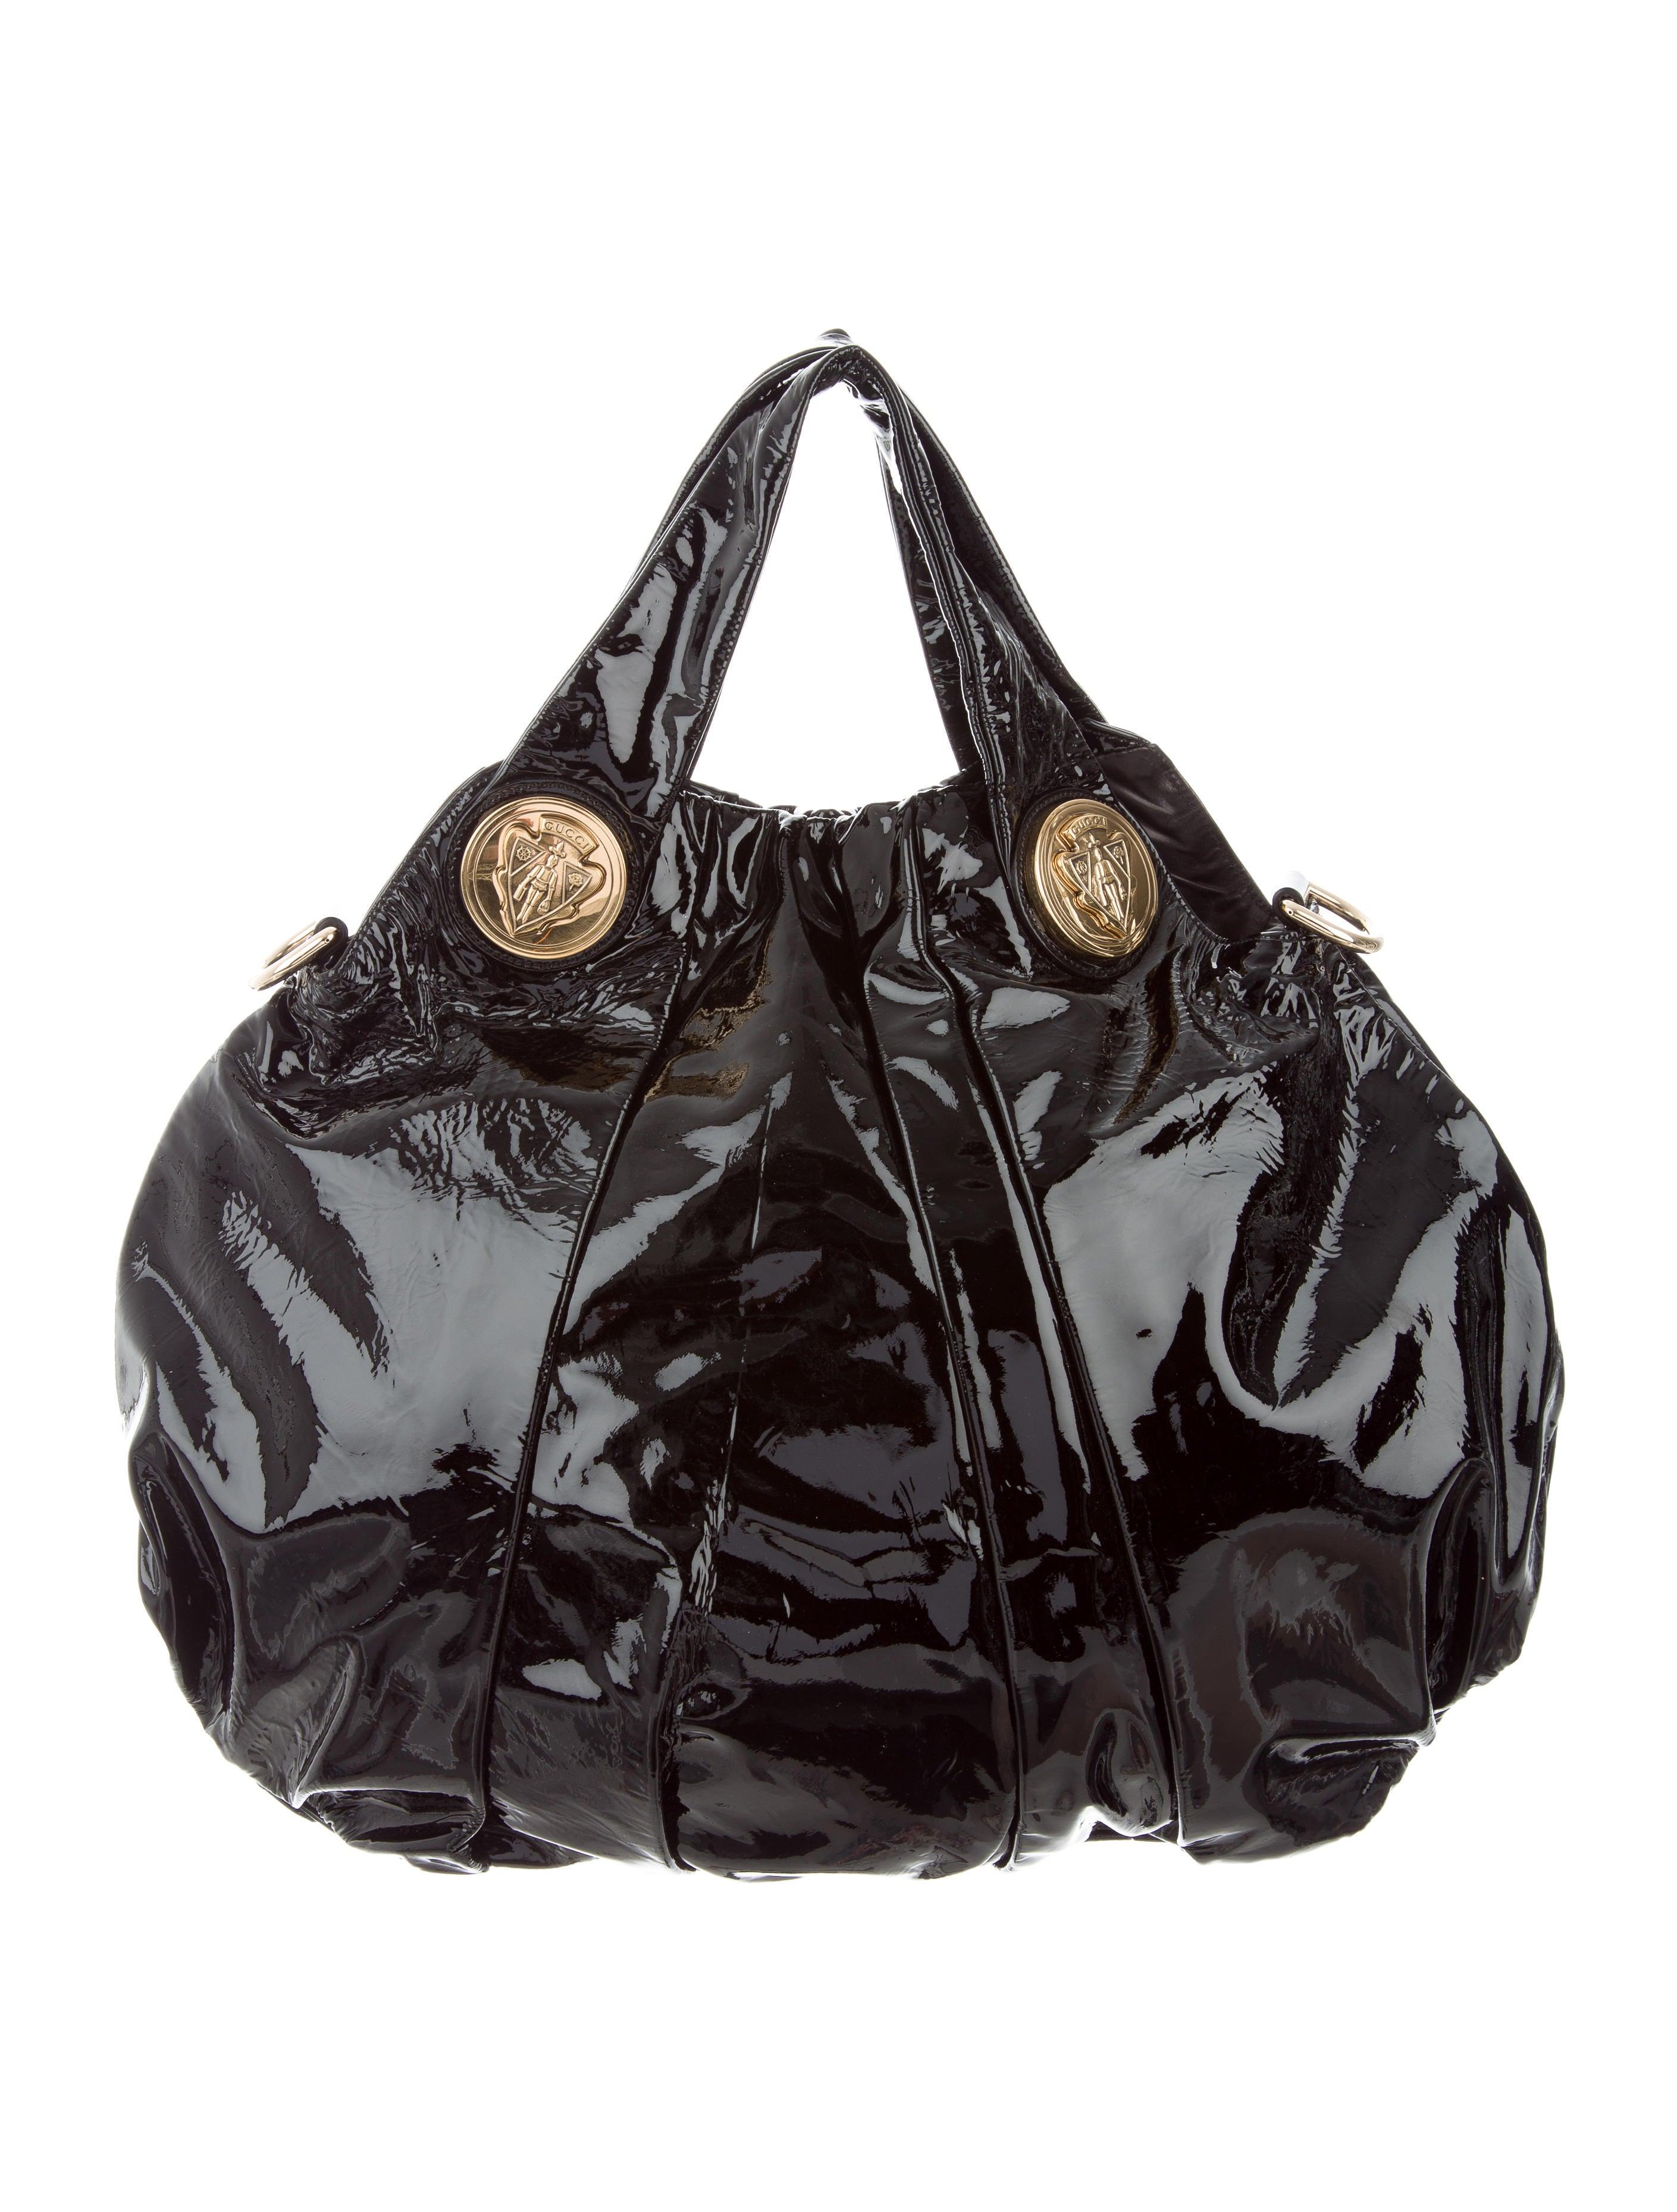 Gucci Patent Leather Hysteria Bag - Handbags - GUC155648  d10bd91e069a4